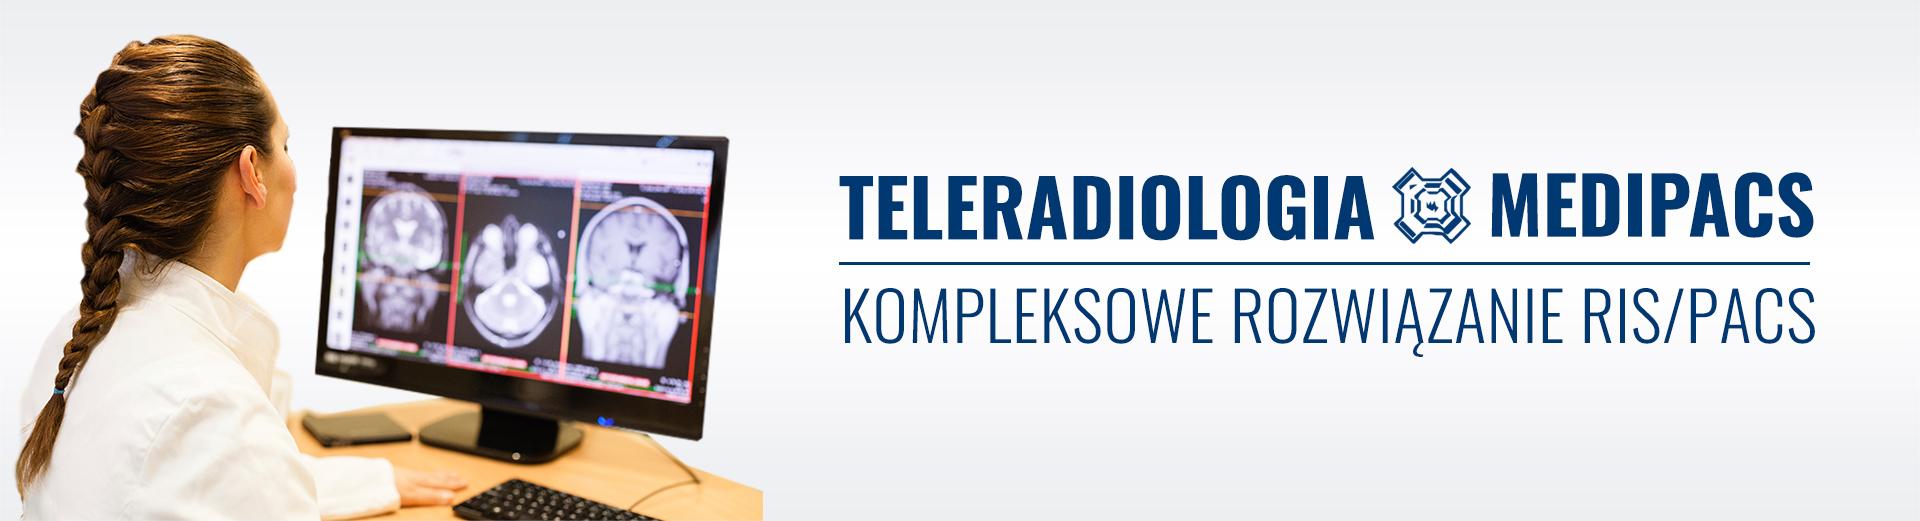 Teleradiologia MEDIPACS - Kompleksowe rozwiązania RIS/PACS